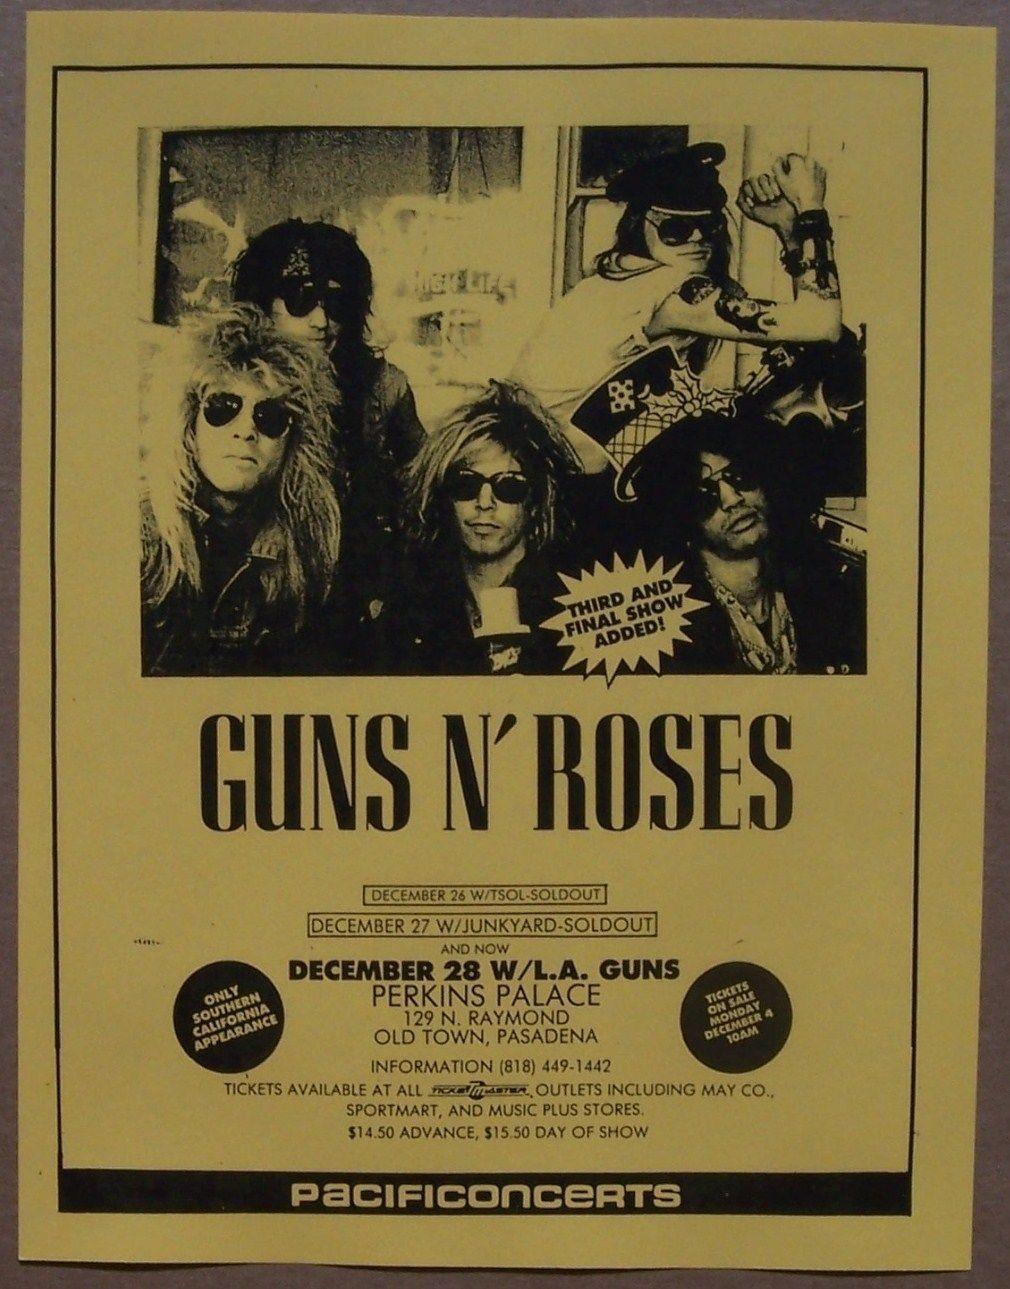 1987.12.28 - Perkins Palace, Pasadena, USA KGrHqZrFGURBKSBRomdKLZw60_57